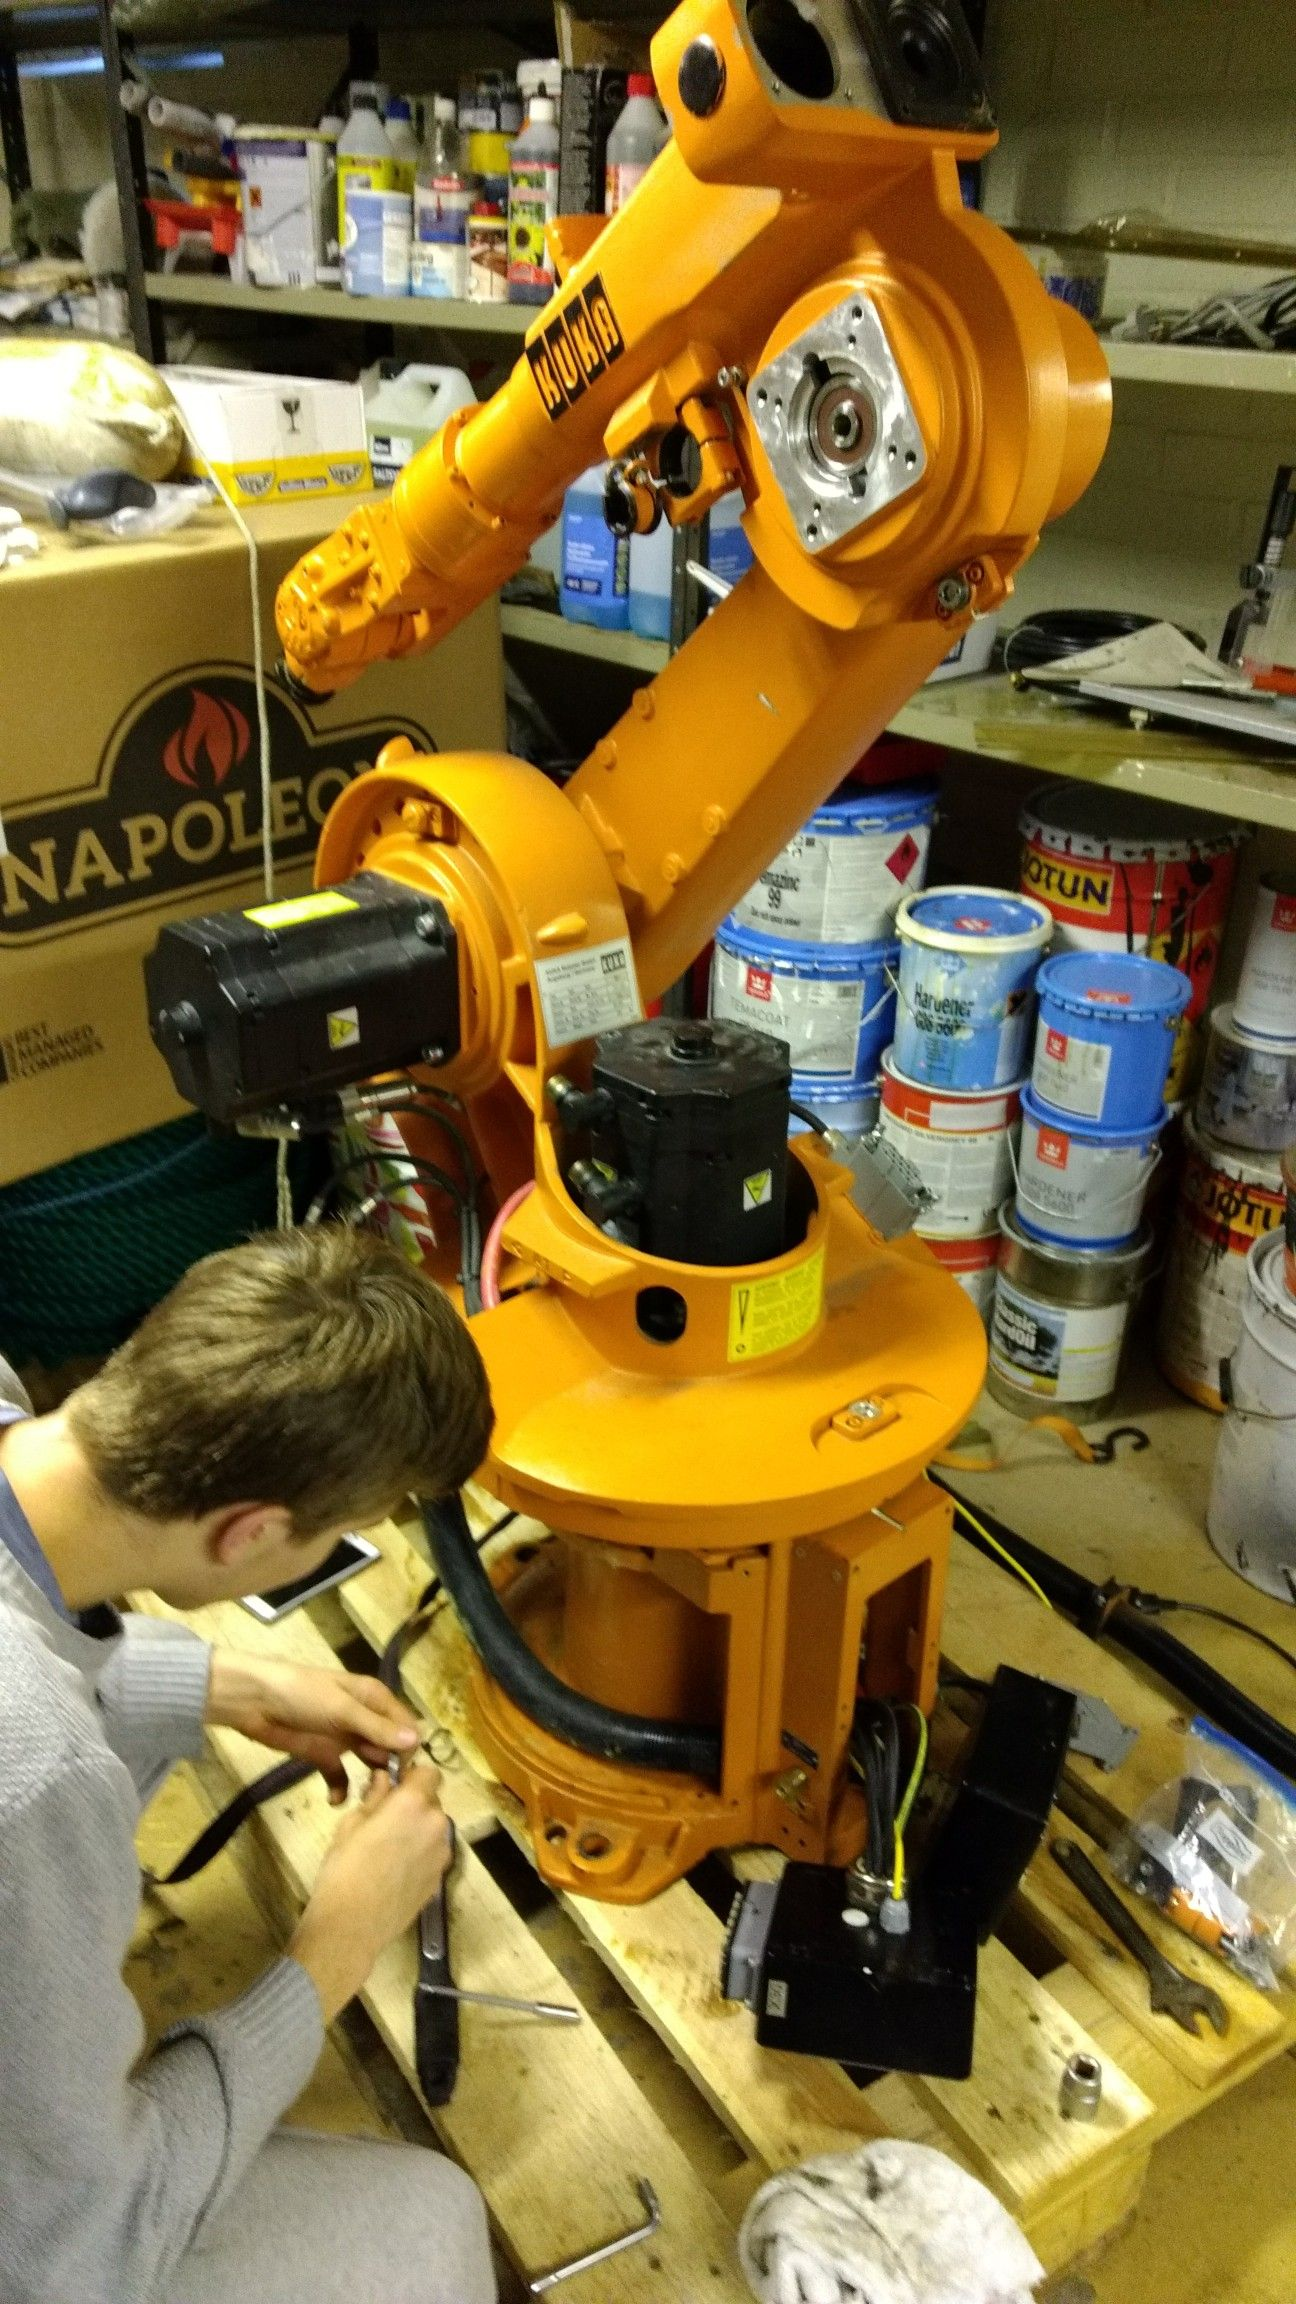 Demonting Servos From Industrial Robot A Kuka Robot Industrial Robotic Arm Robot Structure Robot Design